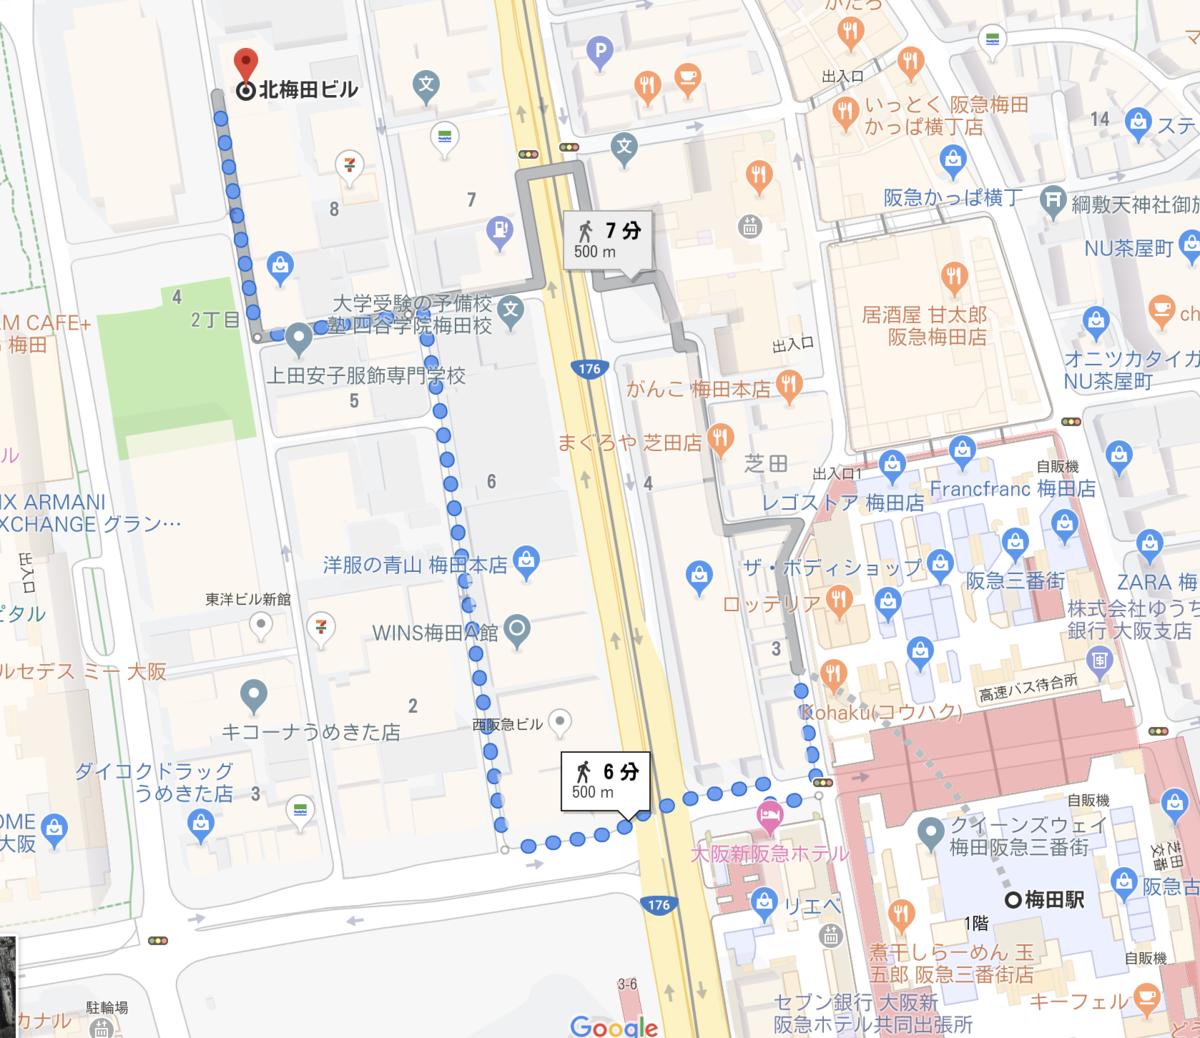 f:id:asatoyo:20190410103010p:plain